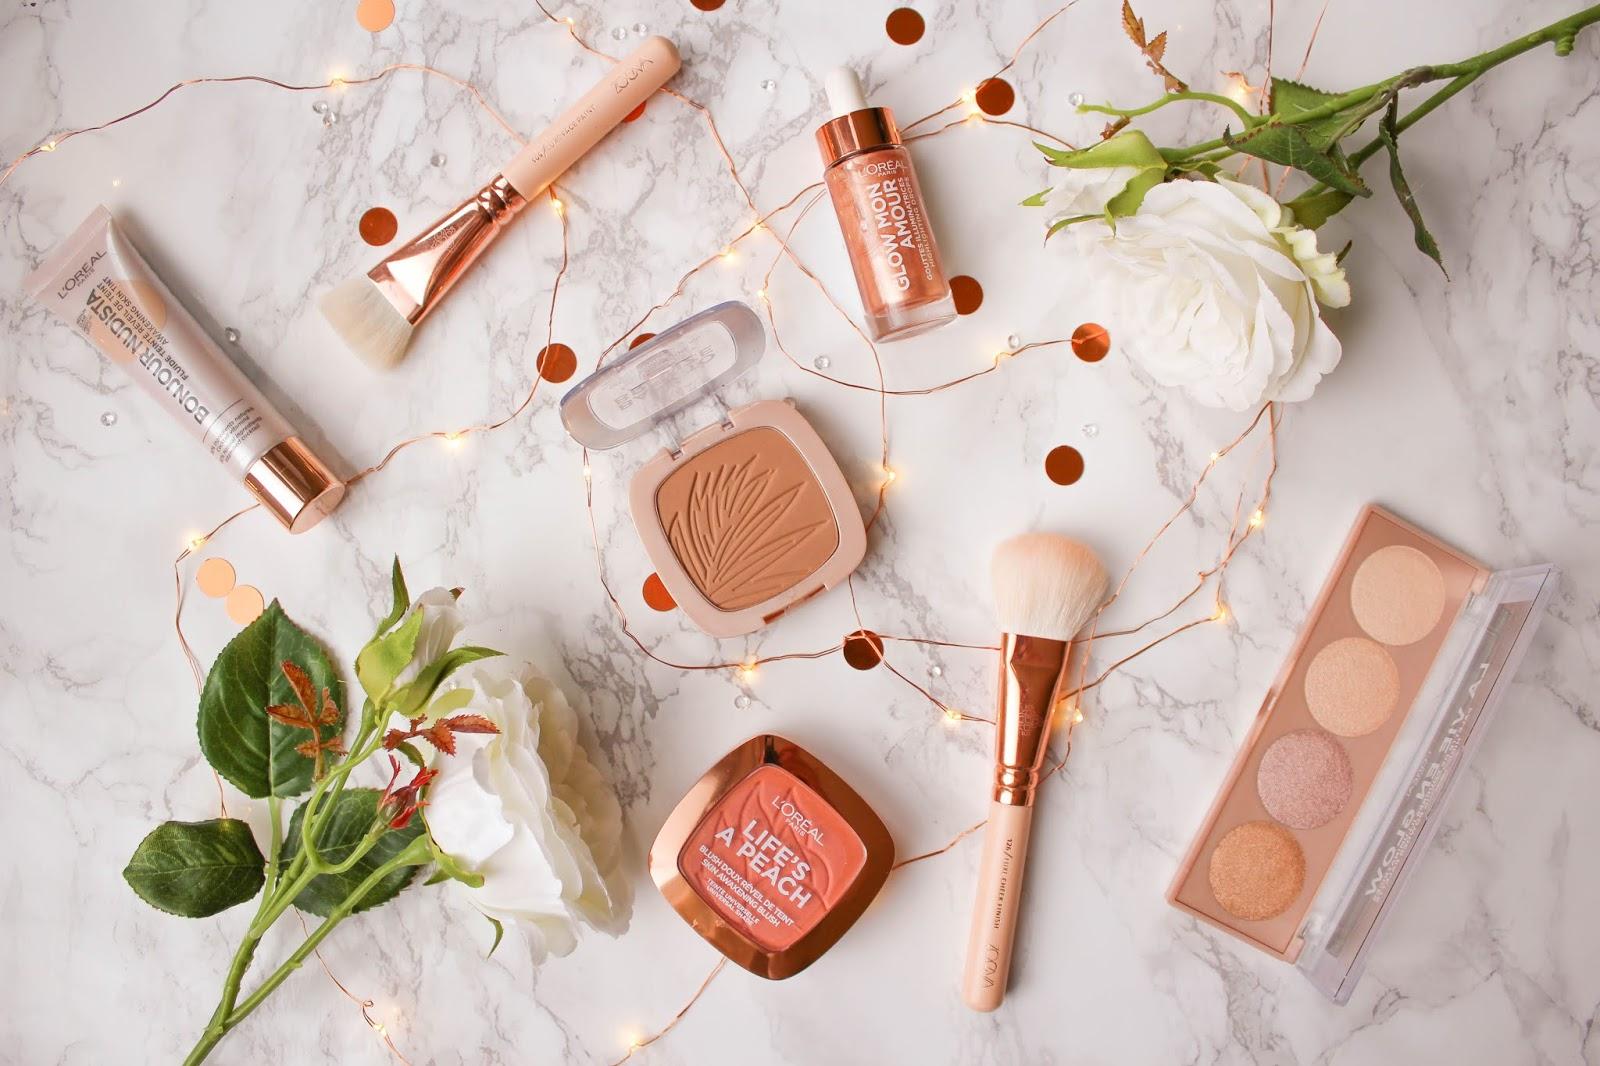 L'Oreal No Makeup Makeup Range - First Impressions